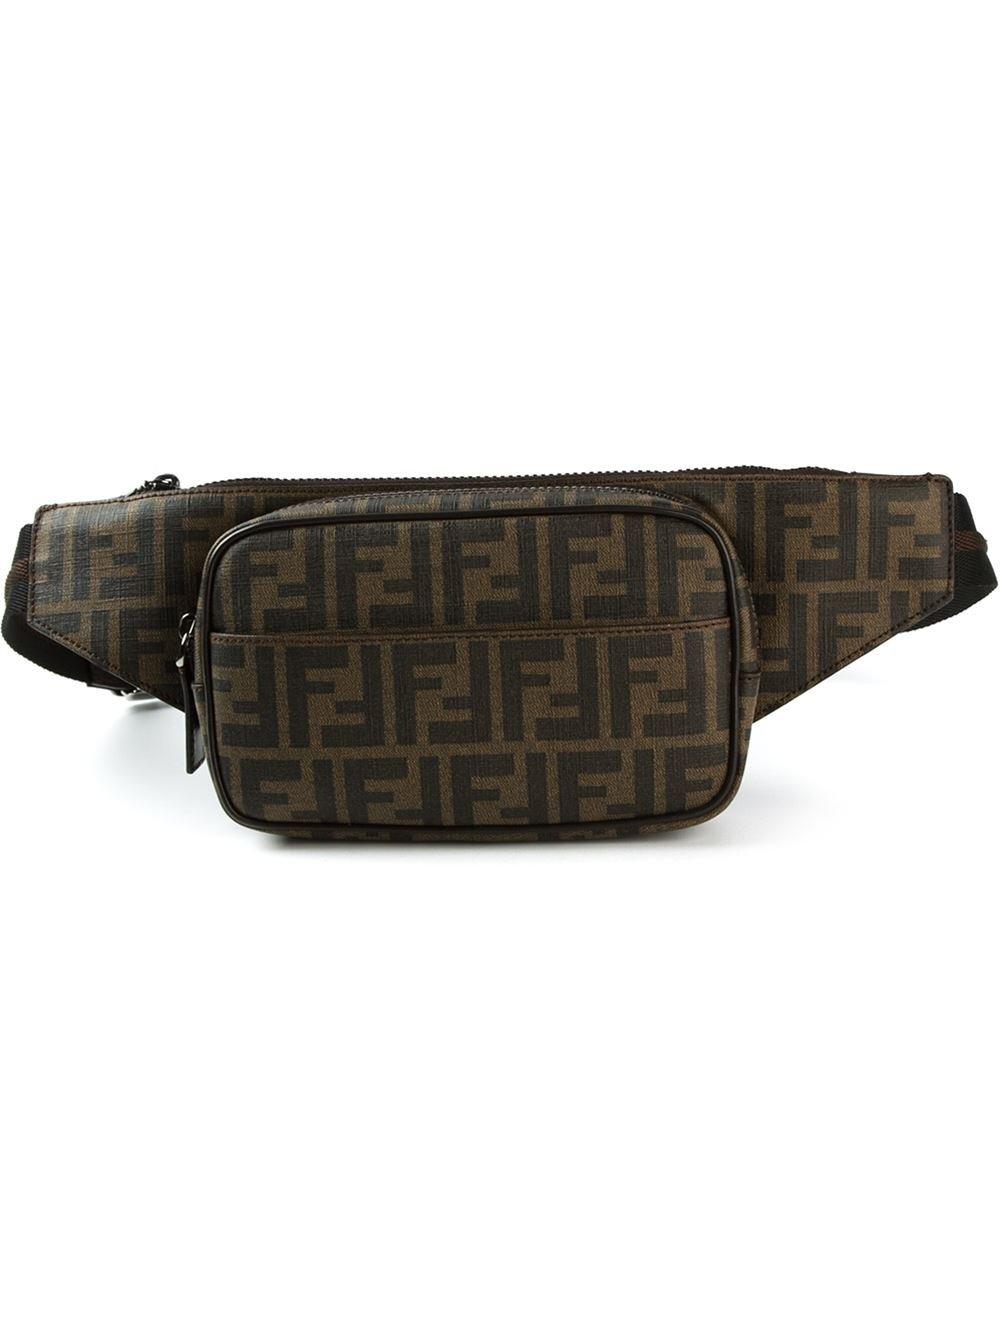 dd0df1bf9c11 ... norway lyst fendi zucca belt bag in brown for men 333db ab25e